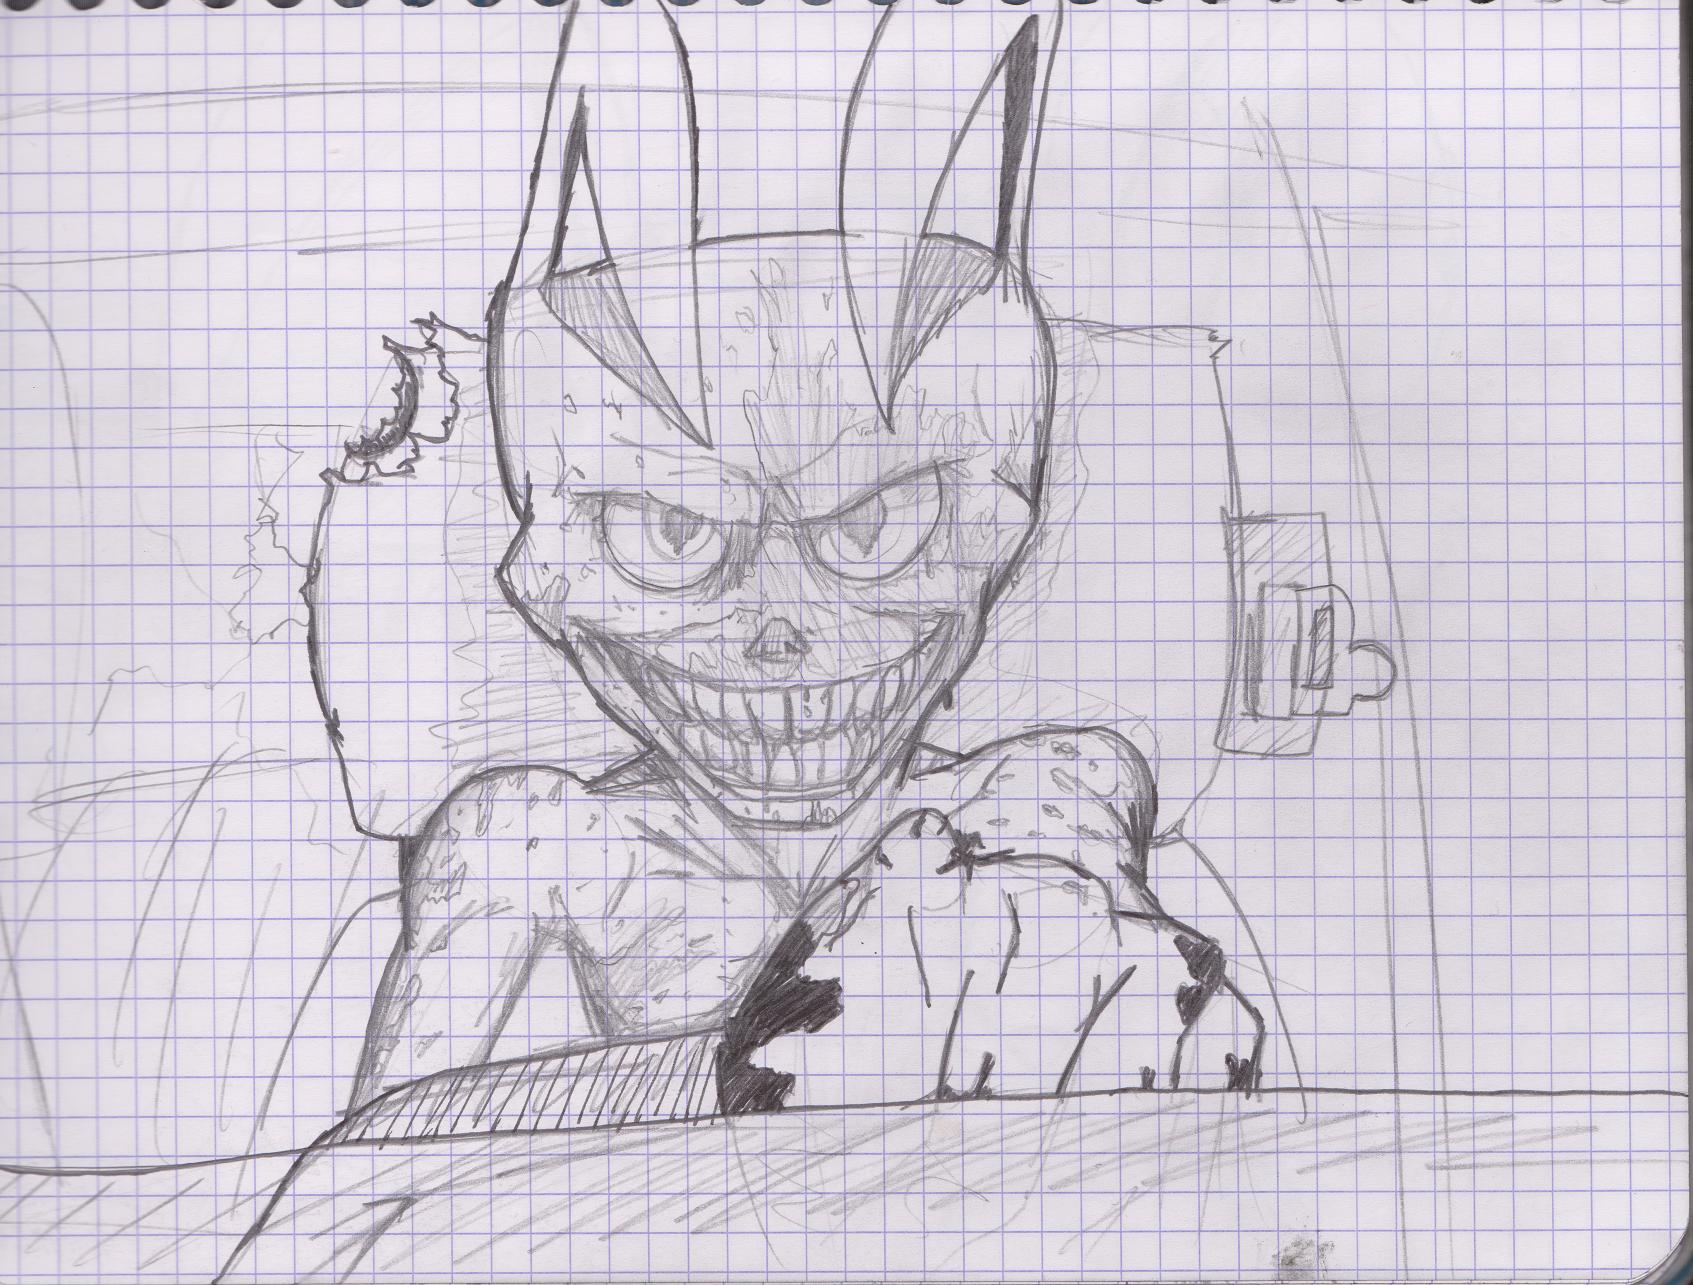 SH sketchbook page 61